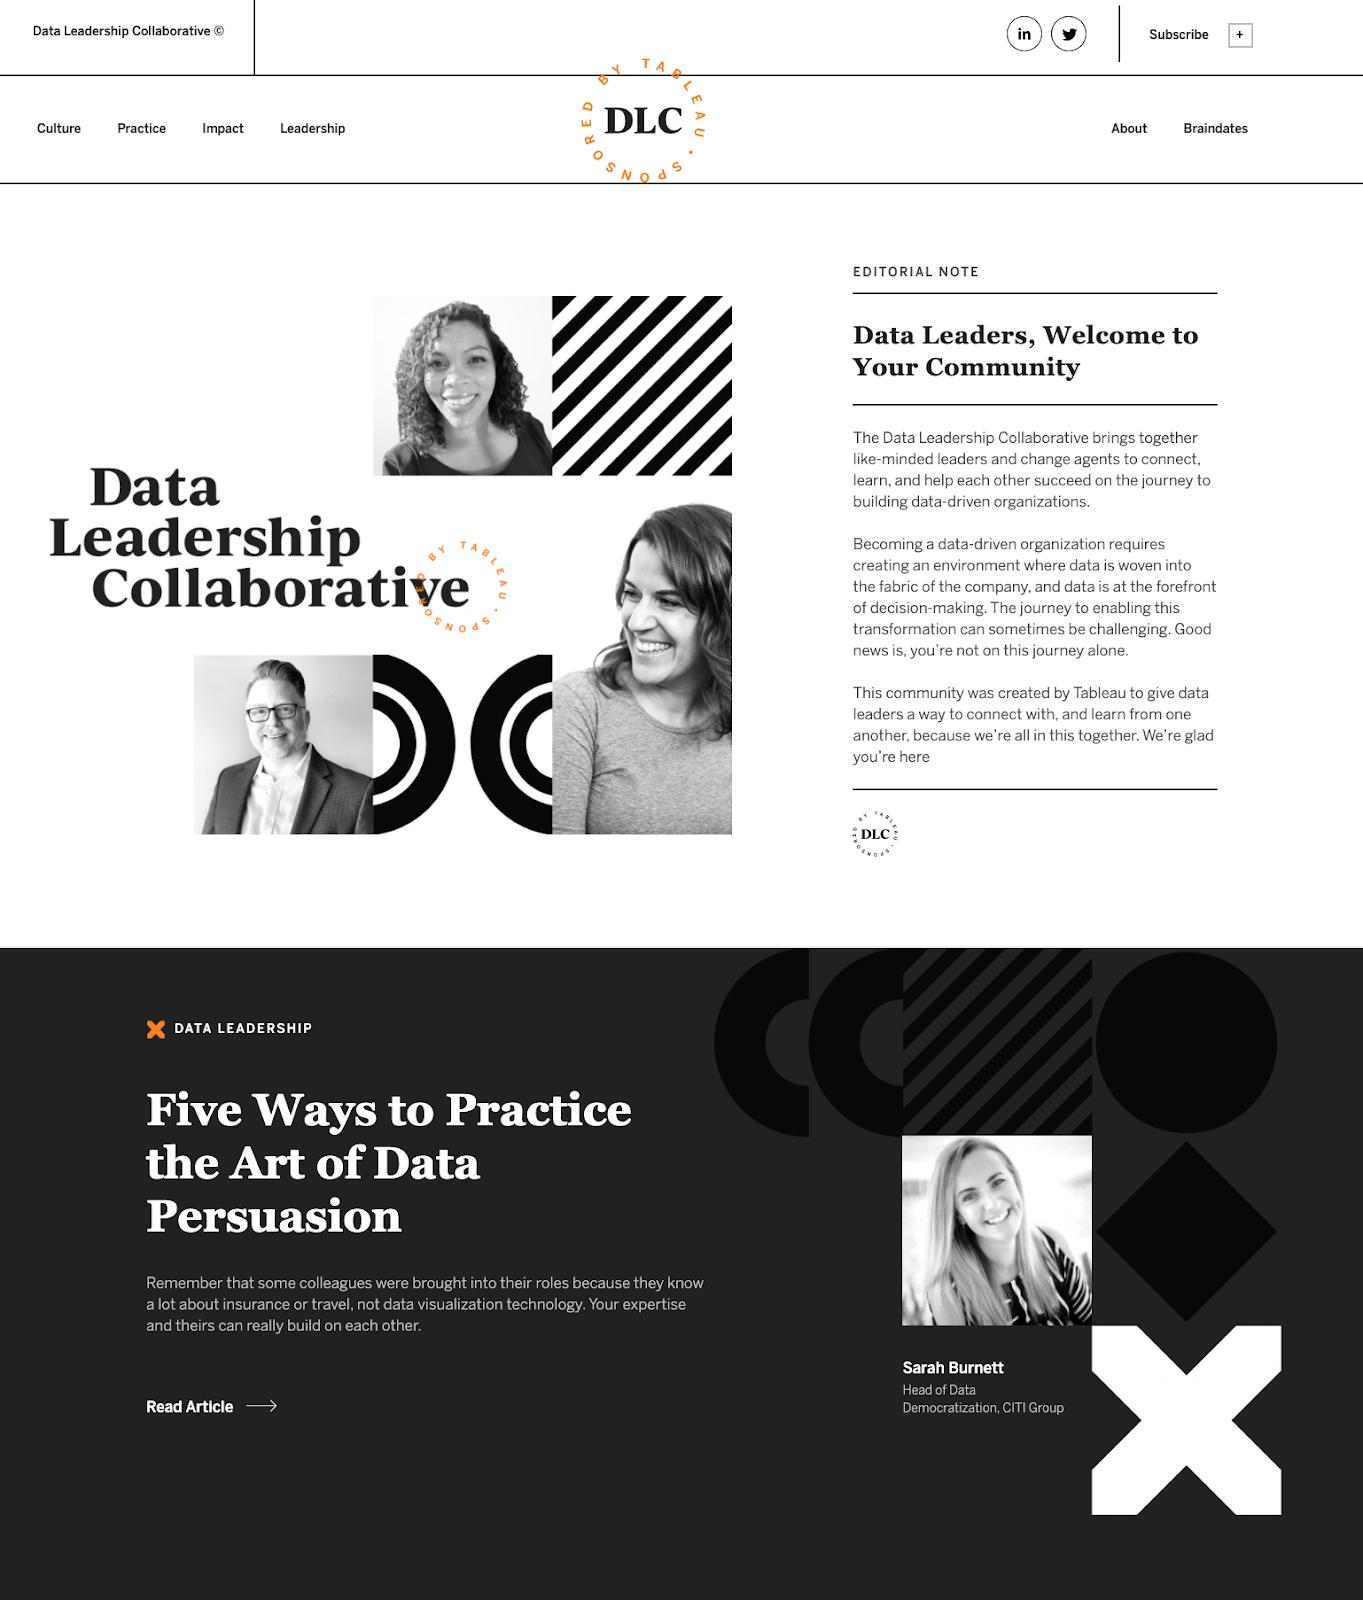 Data Leadership Collaborative website screencap